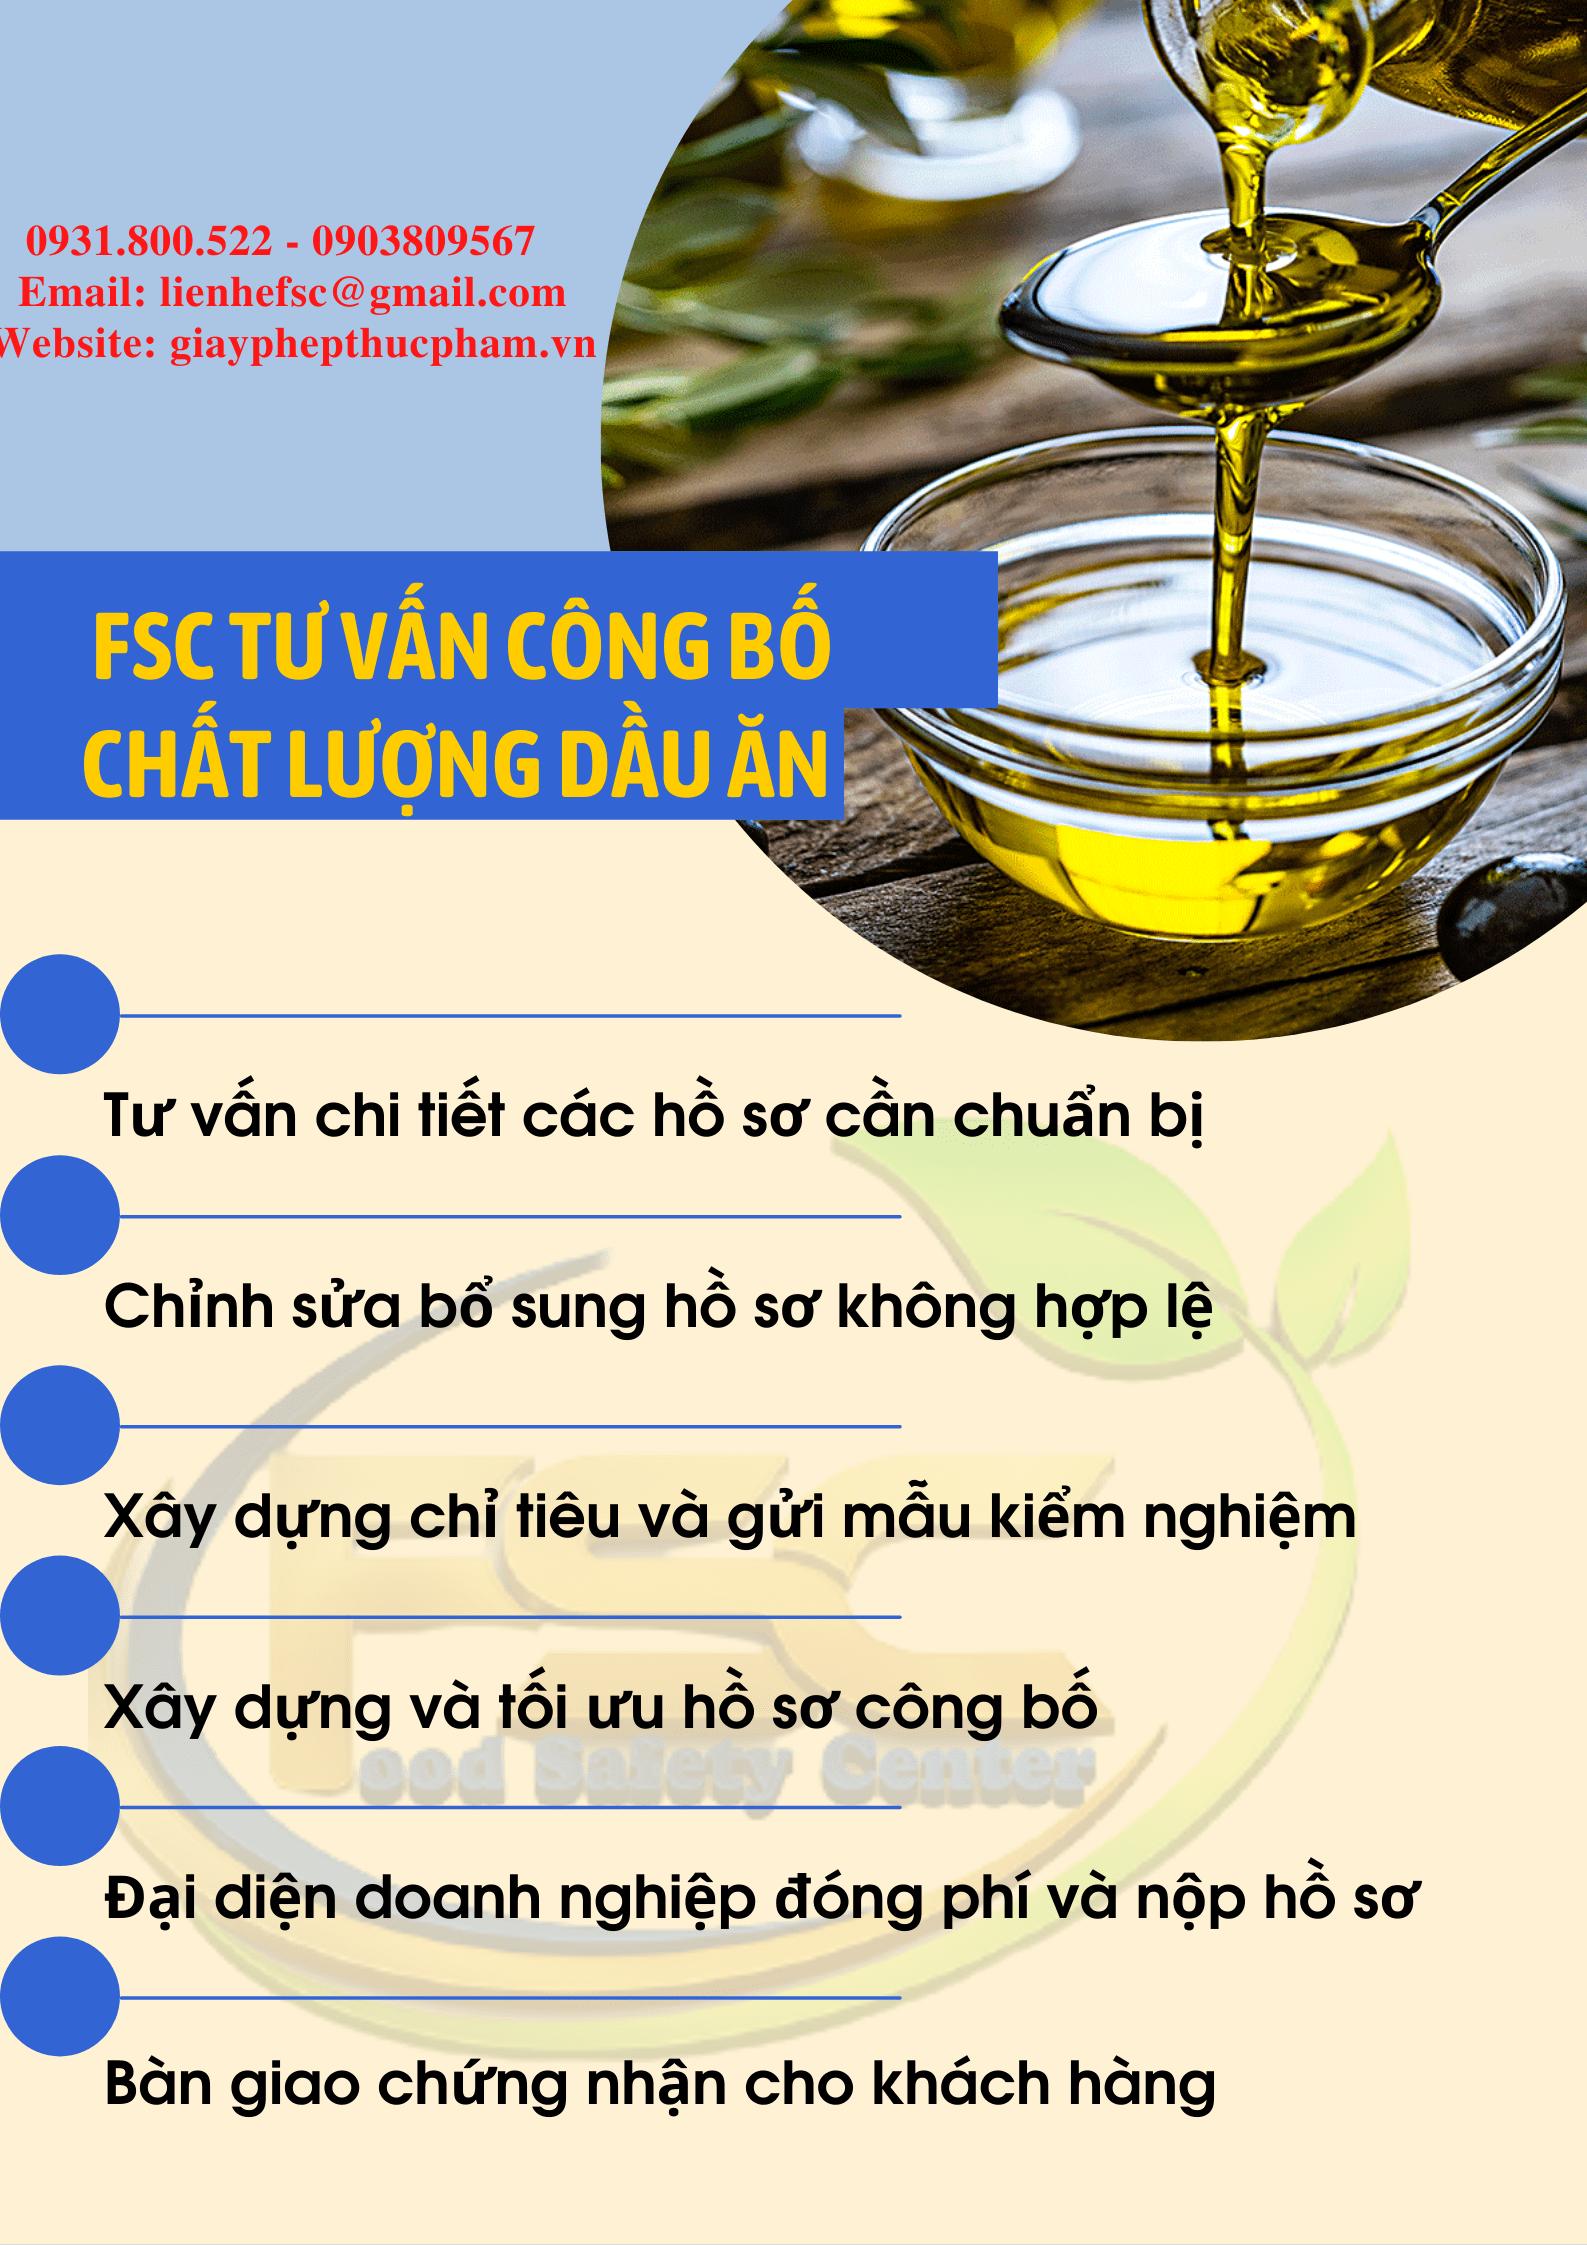 ban-cong-bo-chat-luong-san-pham-dau-an